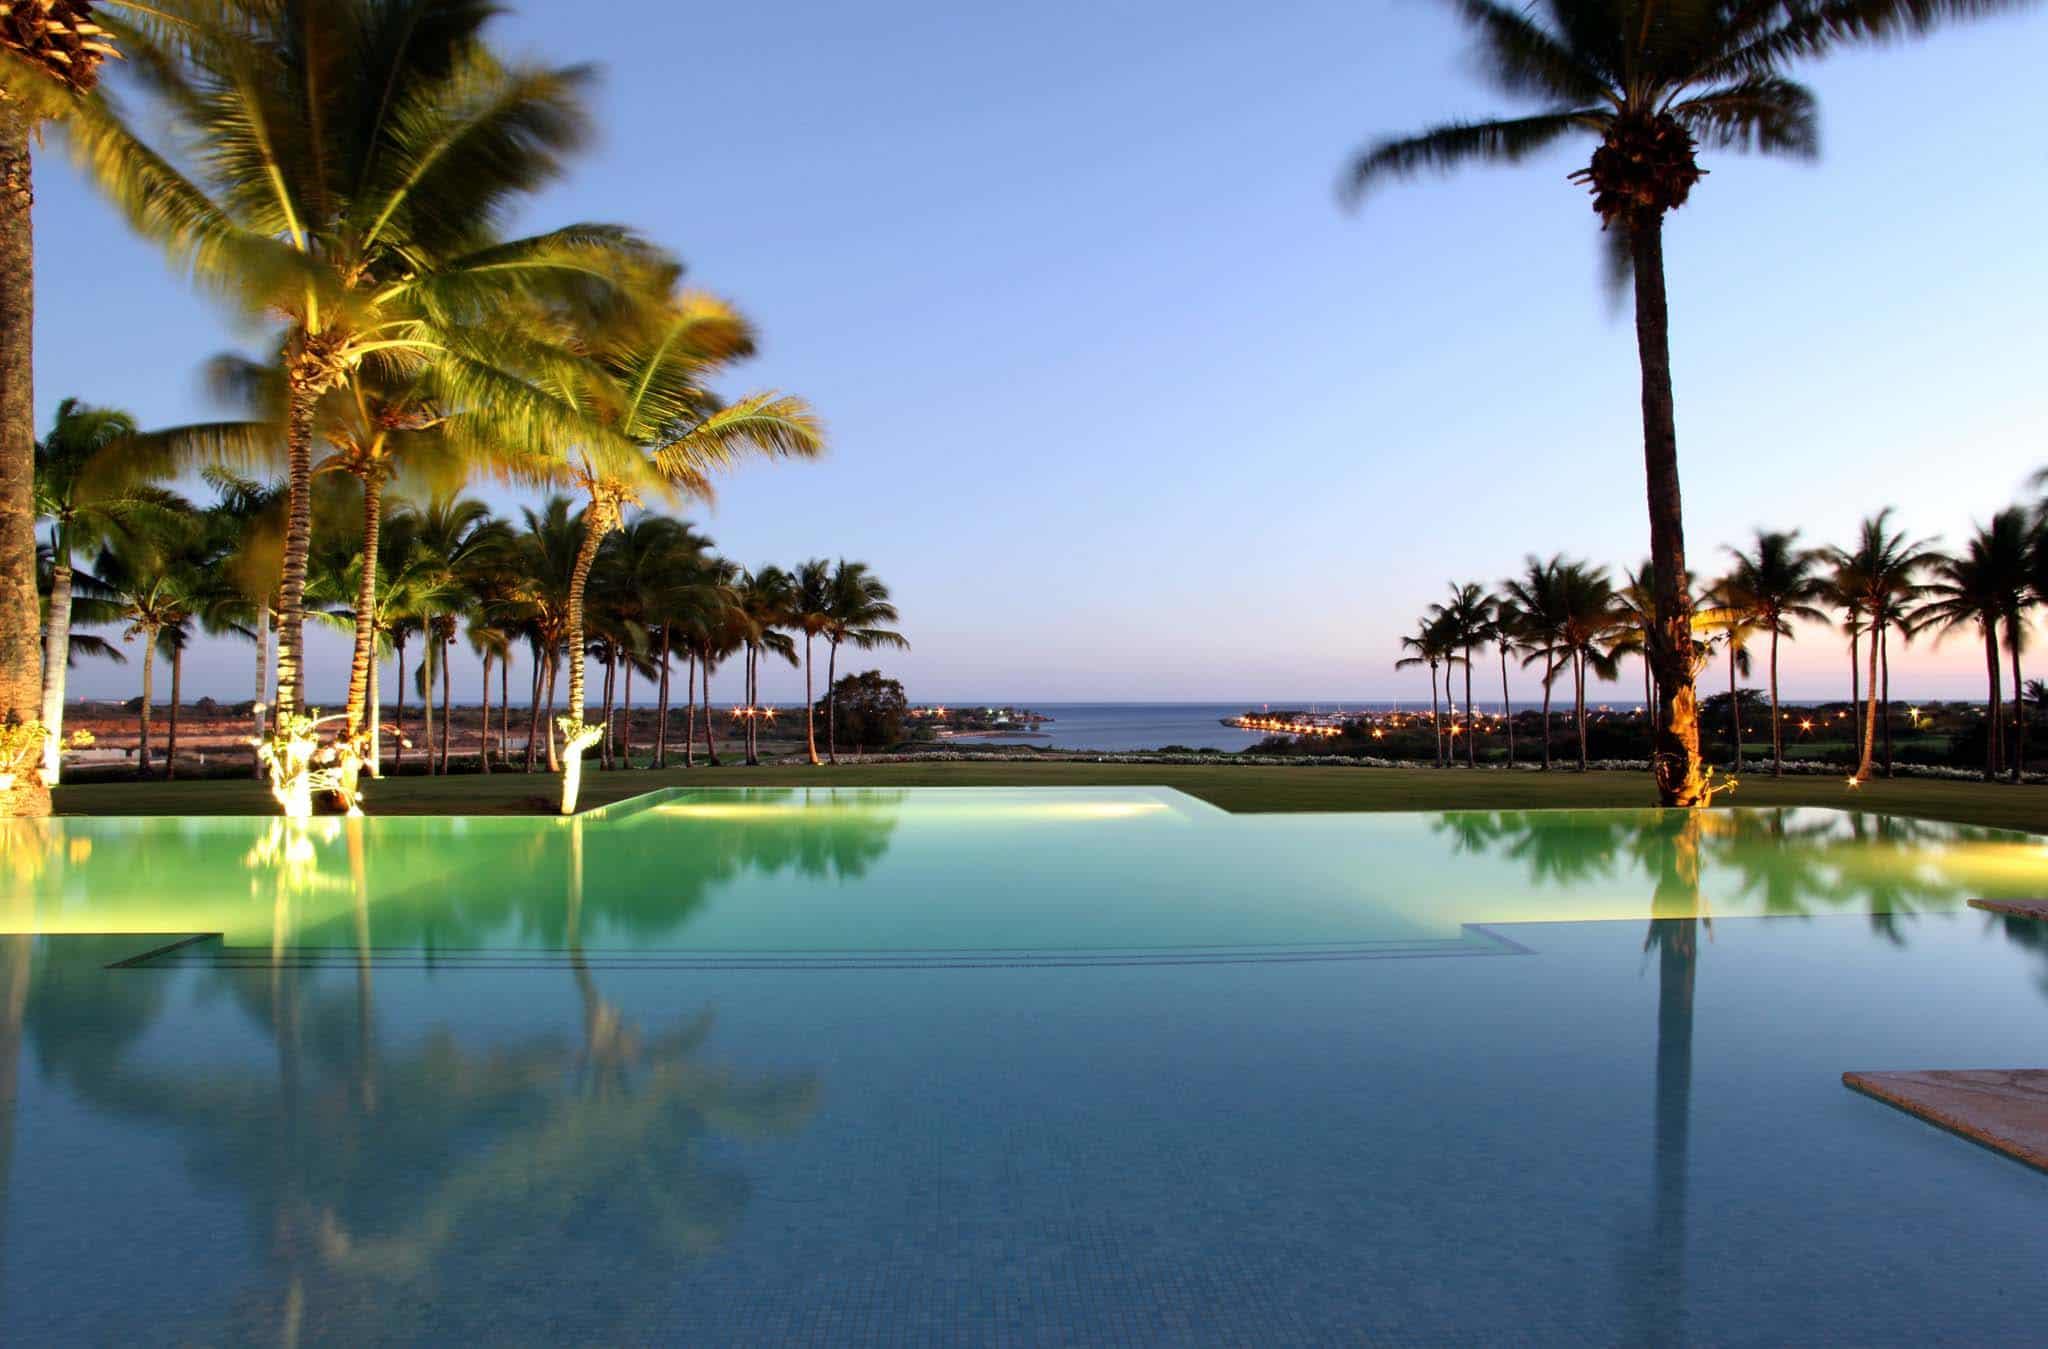 piscina-mar-ricardo-miranda-miret-republica-dominicana